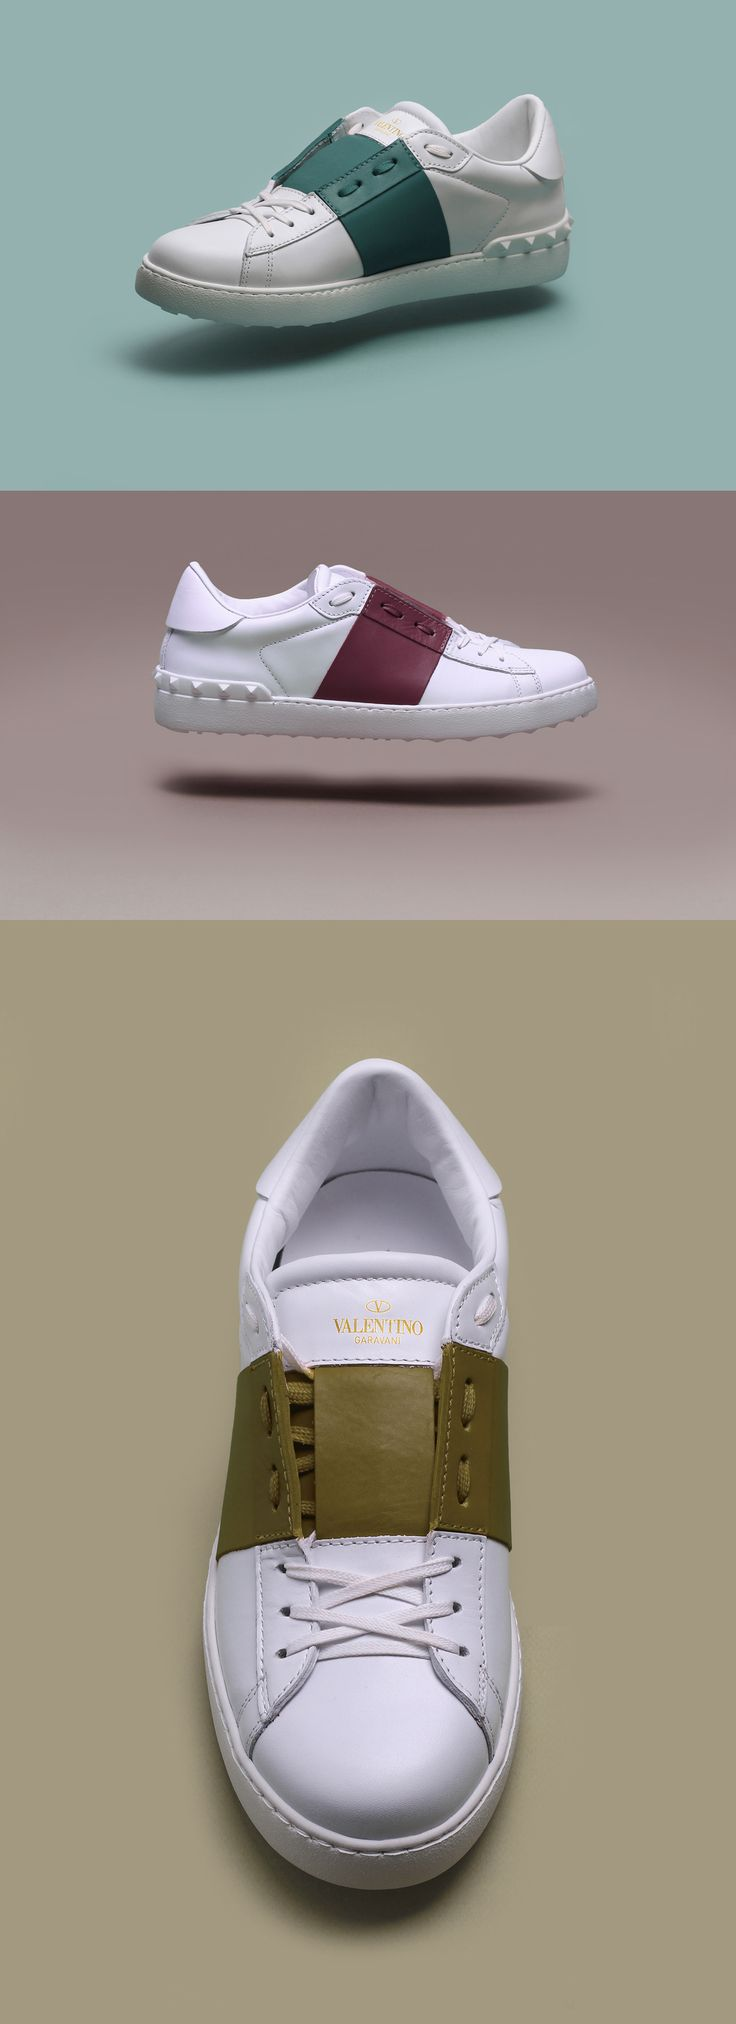 "Next Level Colour Blocking | Valentino Uomo ""Open Sneaker"" | ConceptKicks"